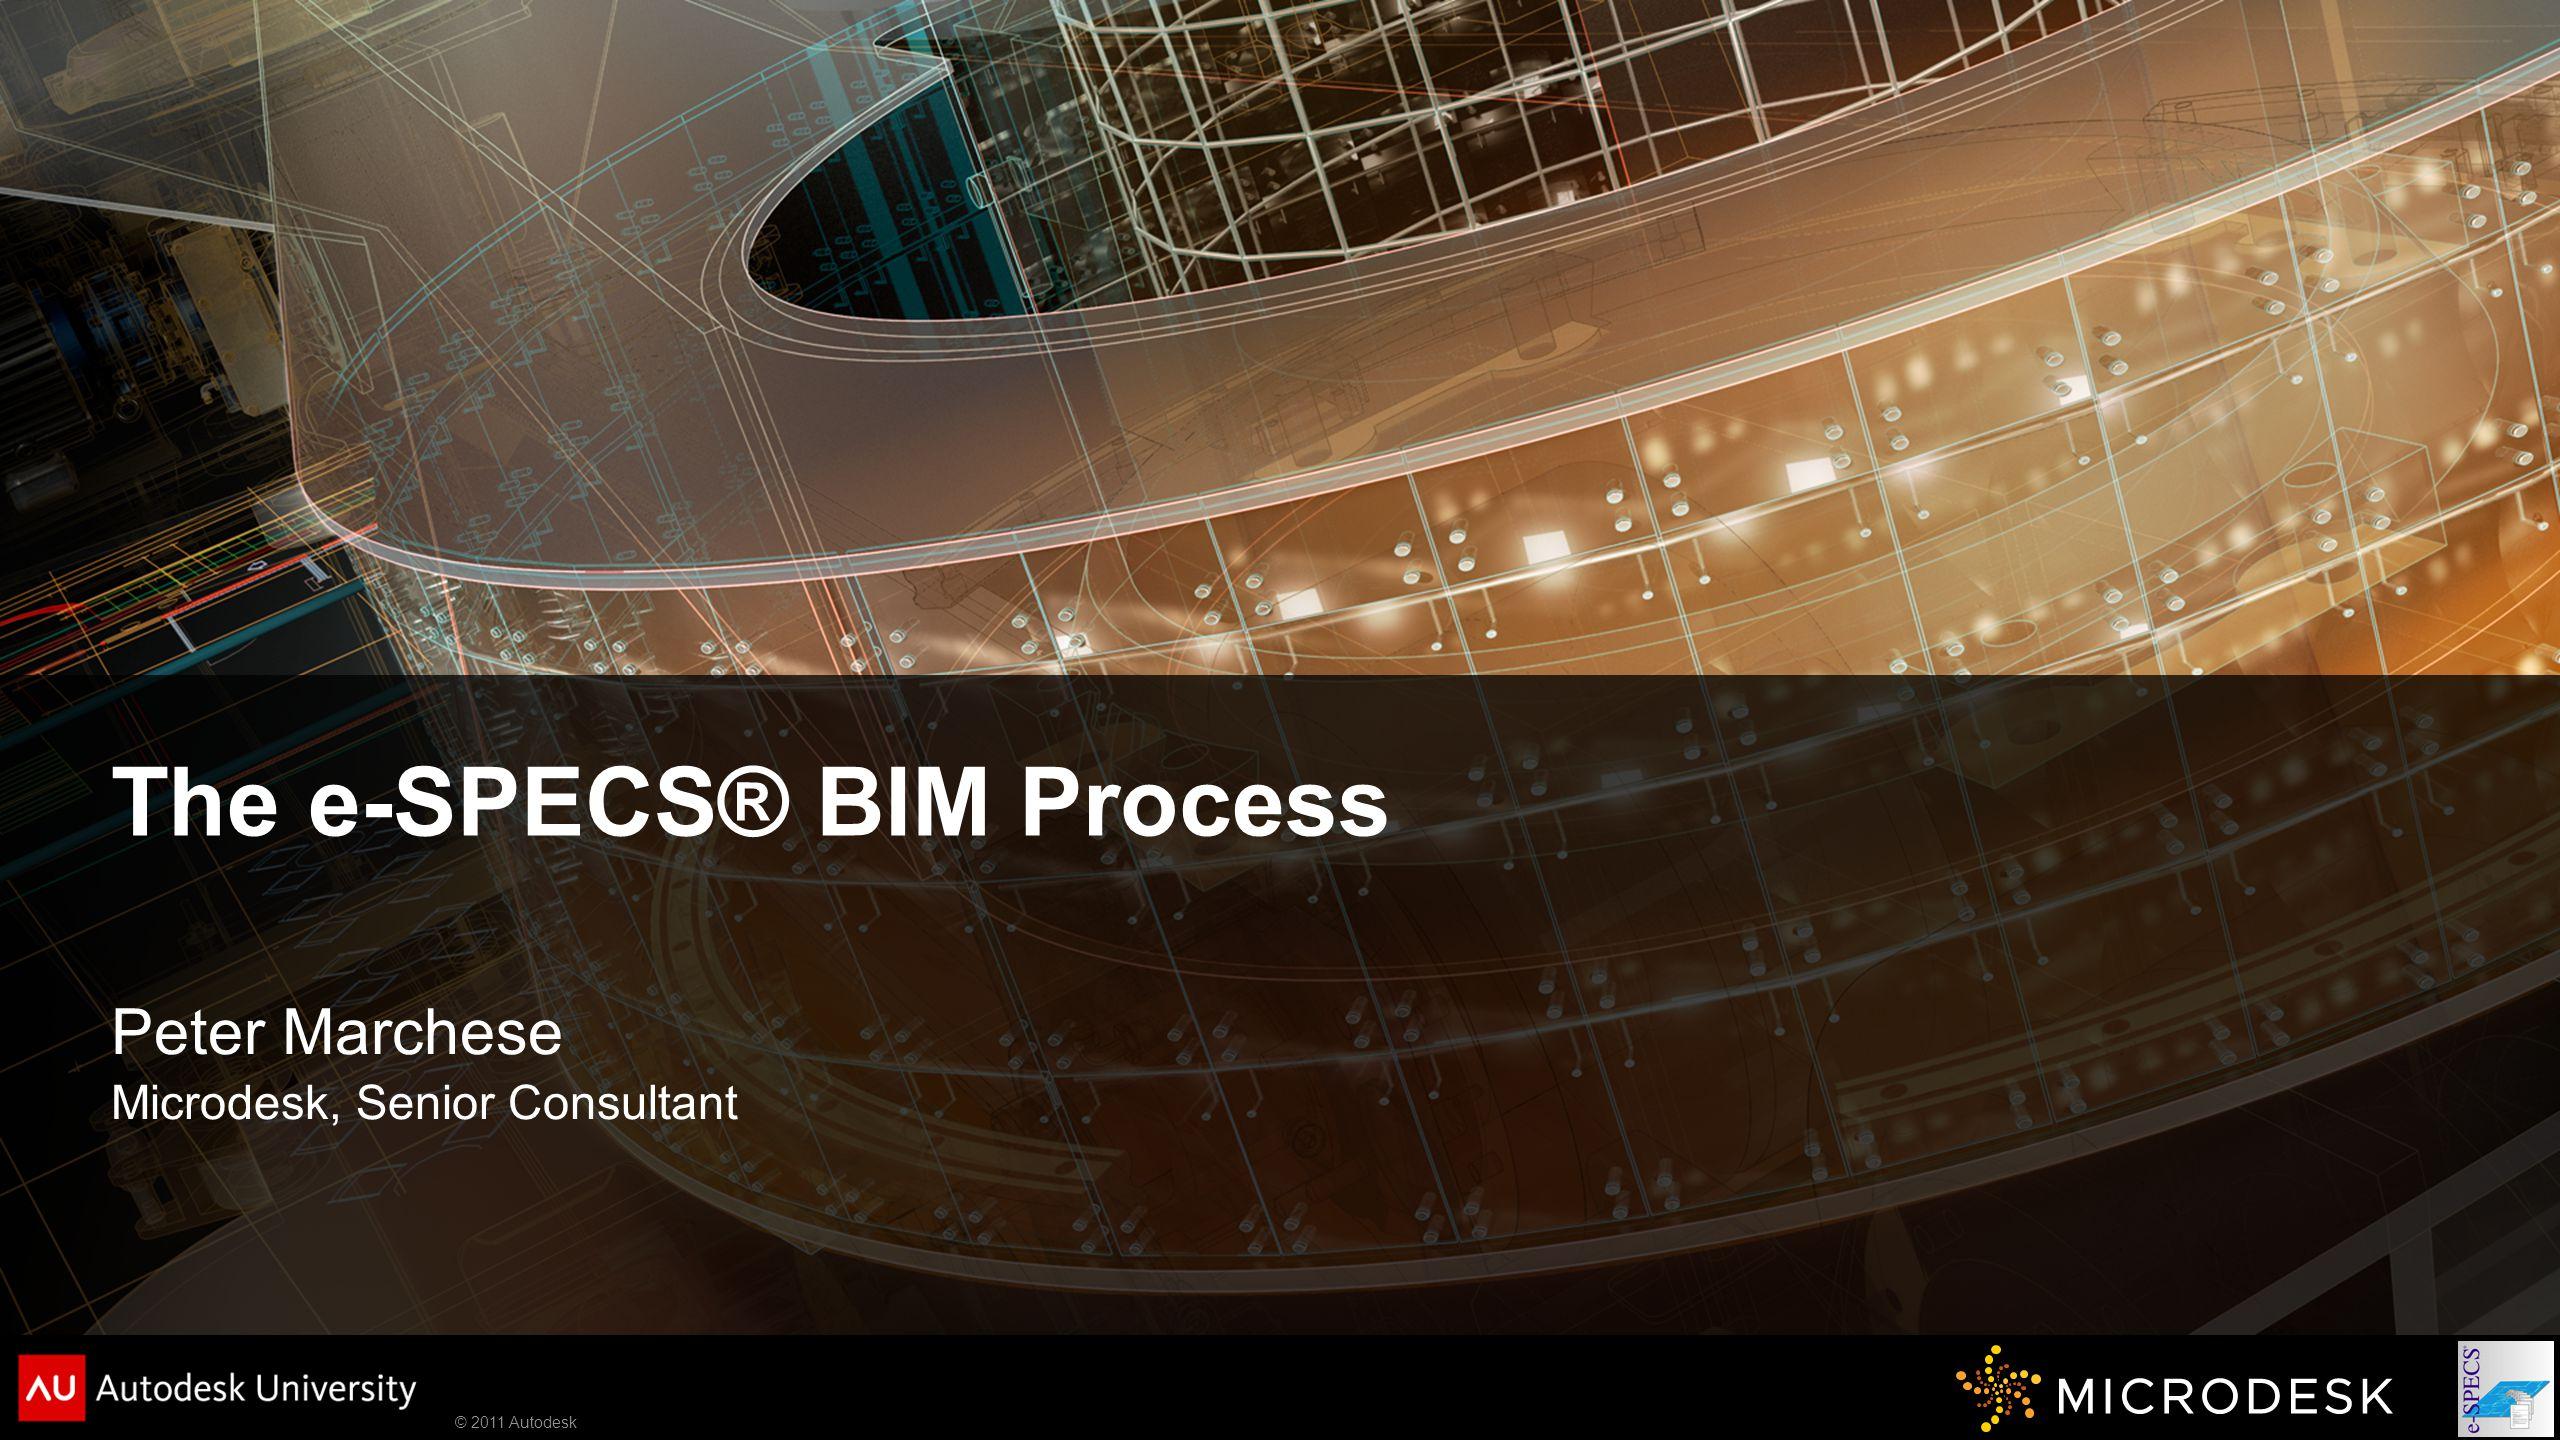 © 2011 Autodesk The e-SPECS® BIM Process Peter Marchese Microdesk, Senior Consultant